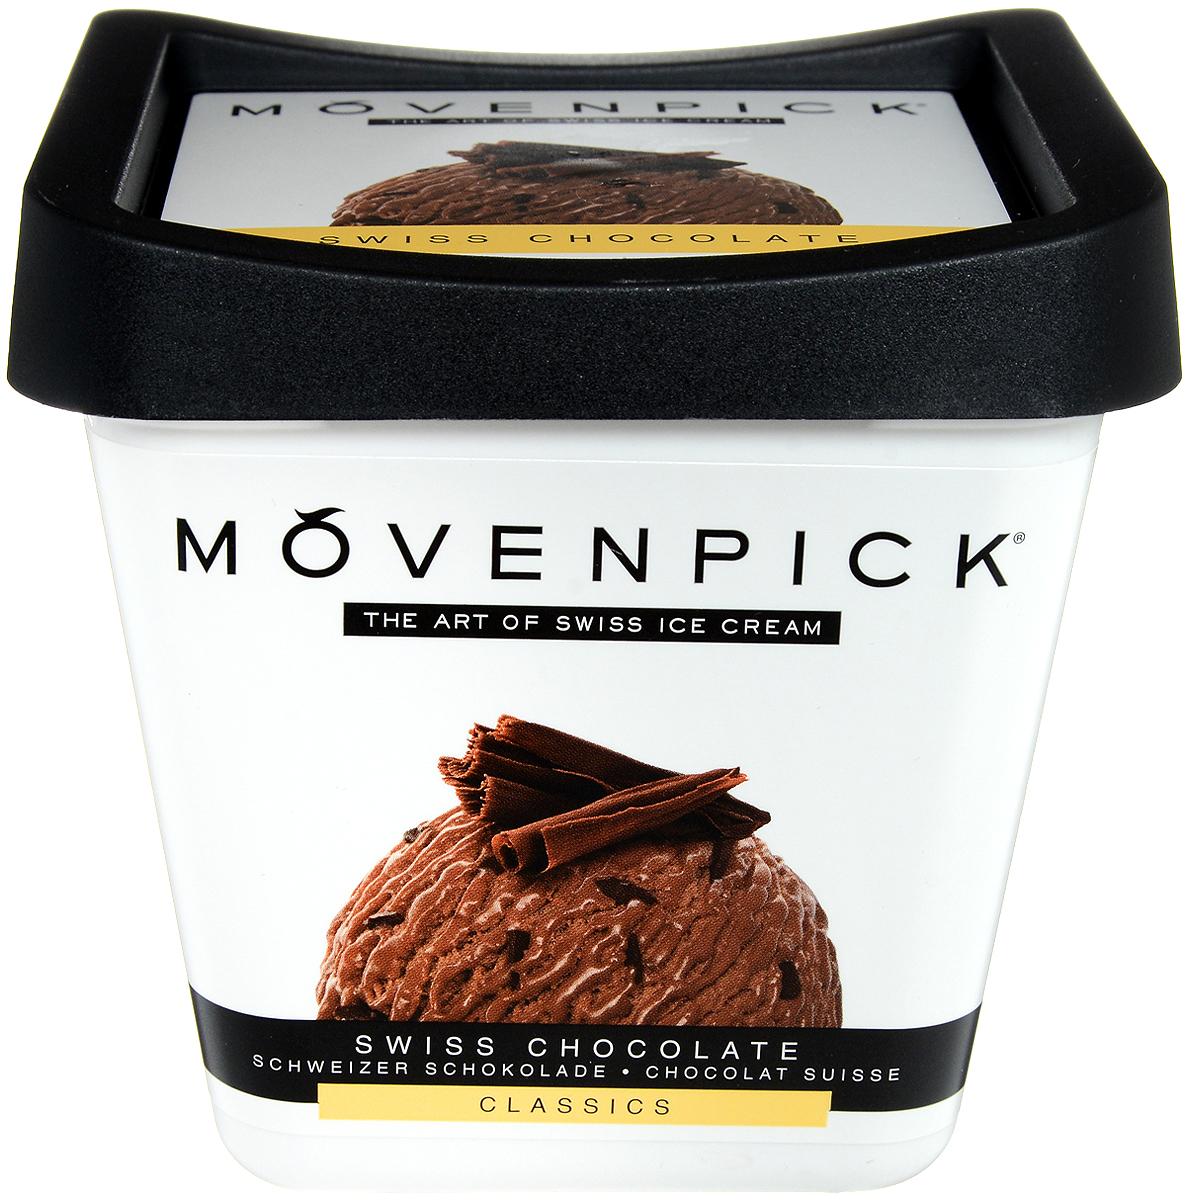 Movenpick Мороженое Шоколад, 500 мл movenpick мороженое фисташковое 900 мл